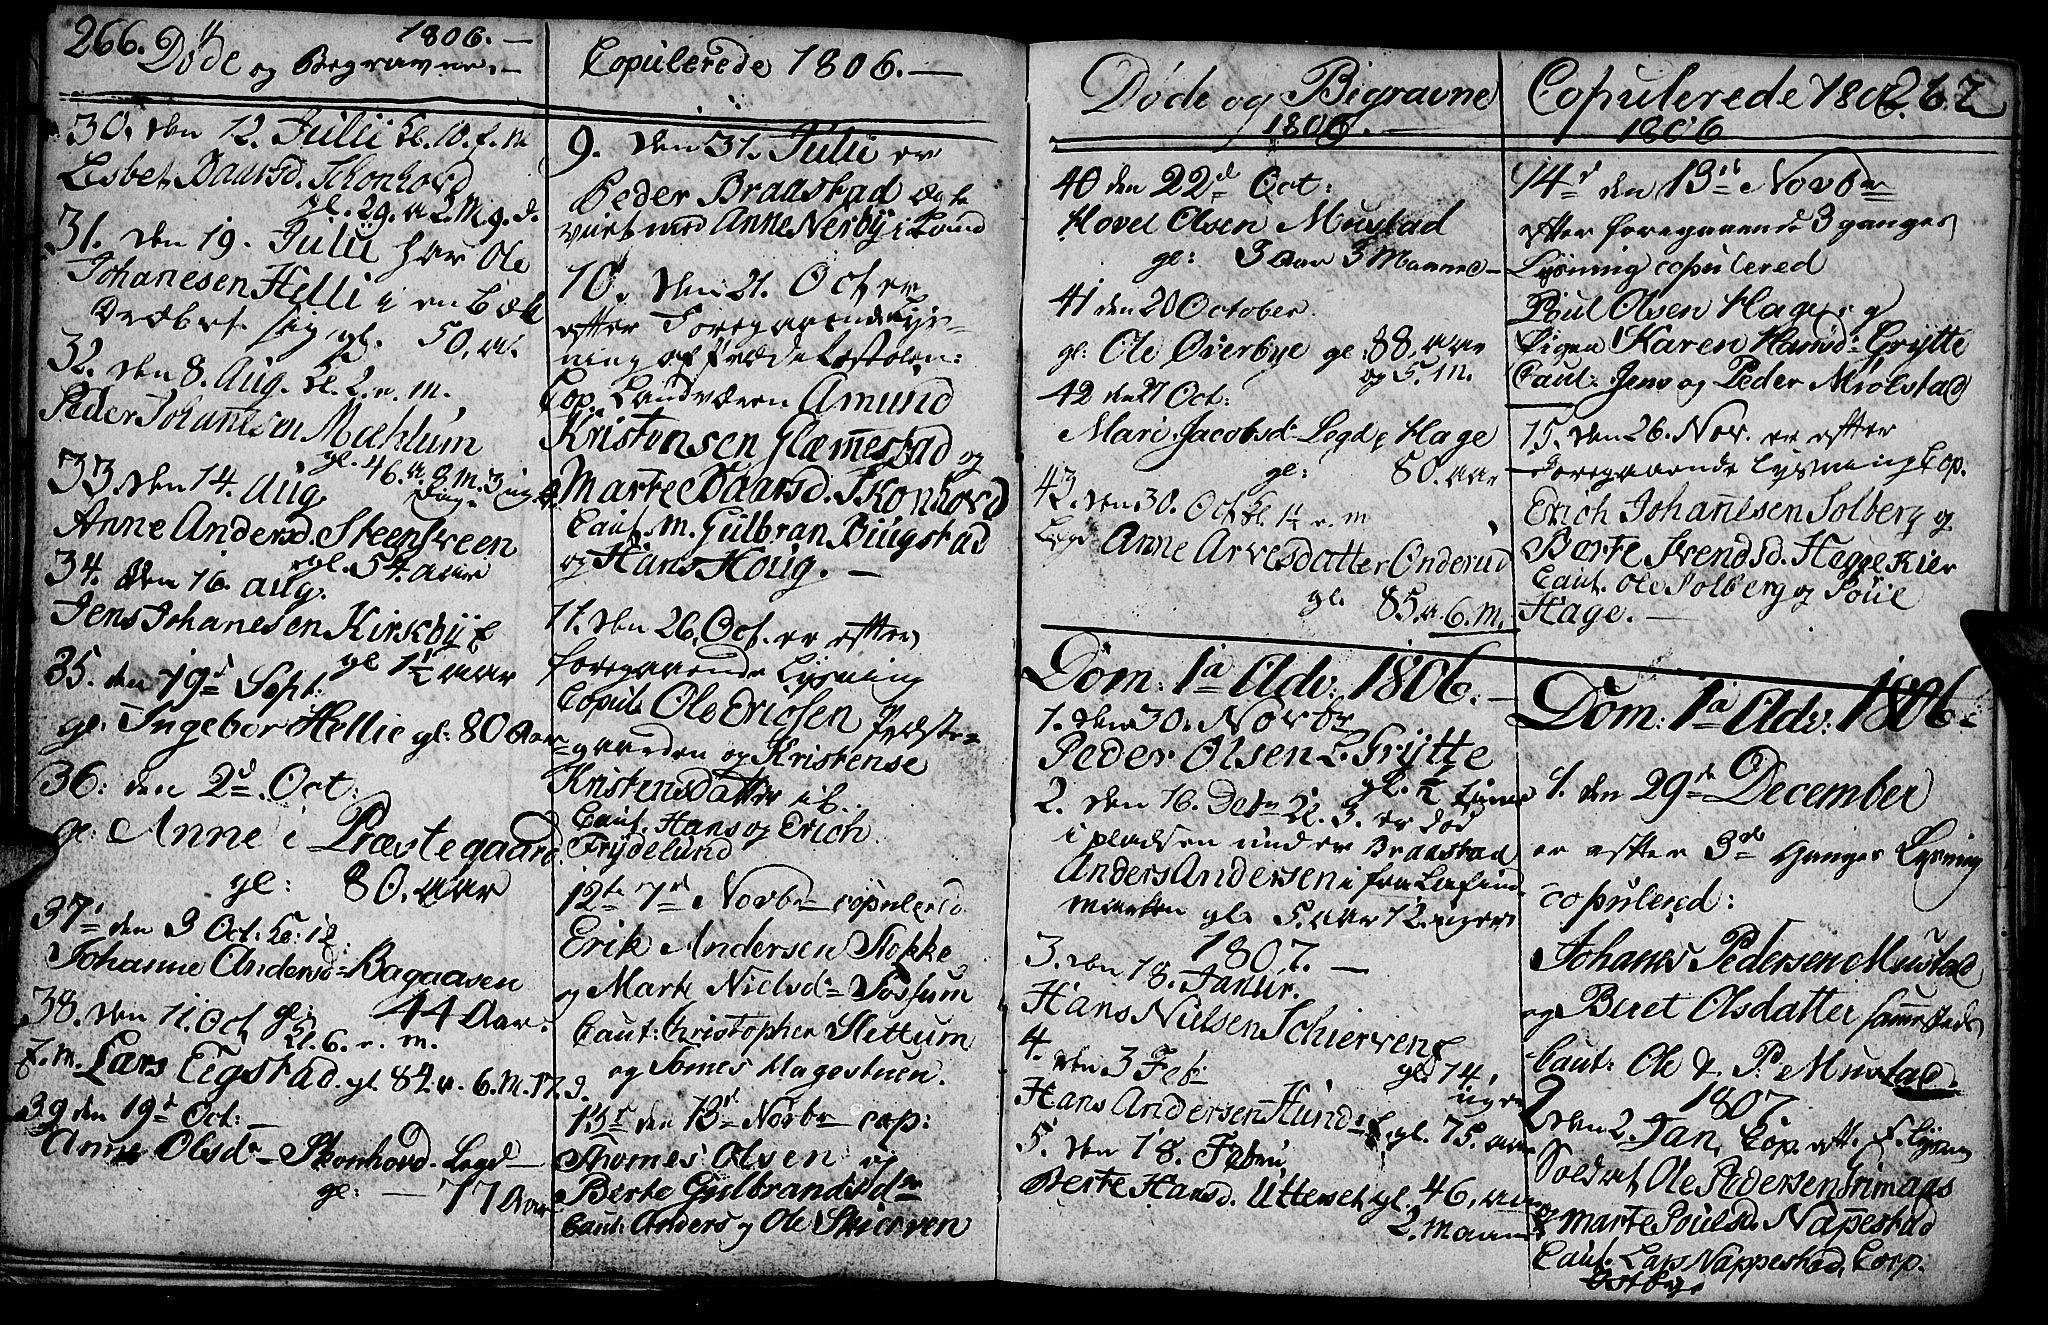 SAH, Vardal prestekontor, H/Ha/Hab/L0003: Klokkerbok nr. 3, 1803-1808, s. 266-267